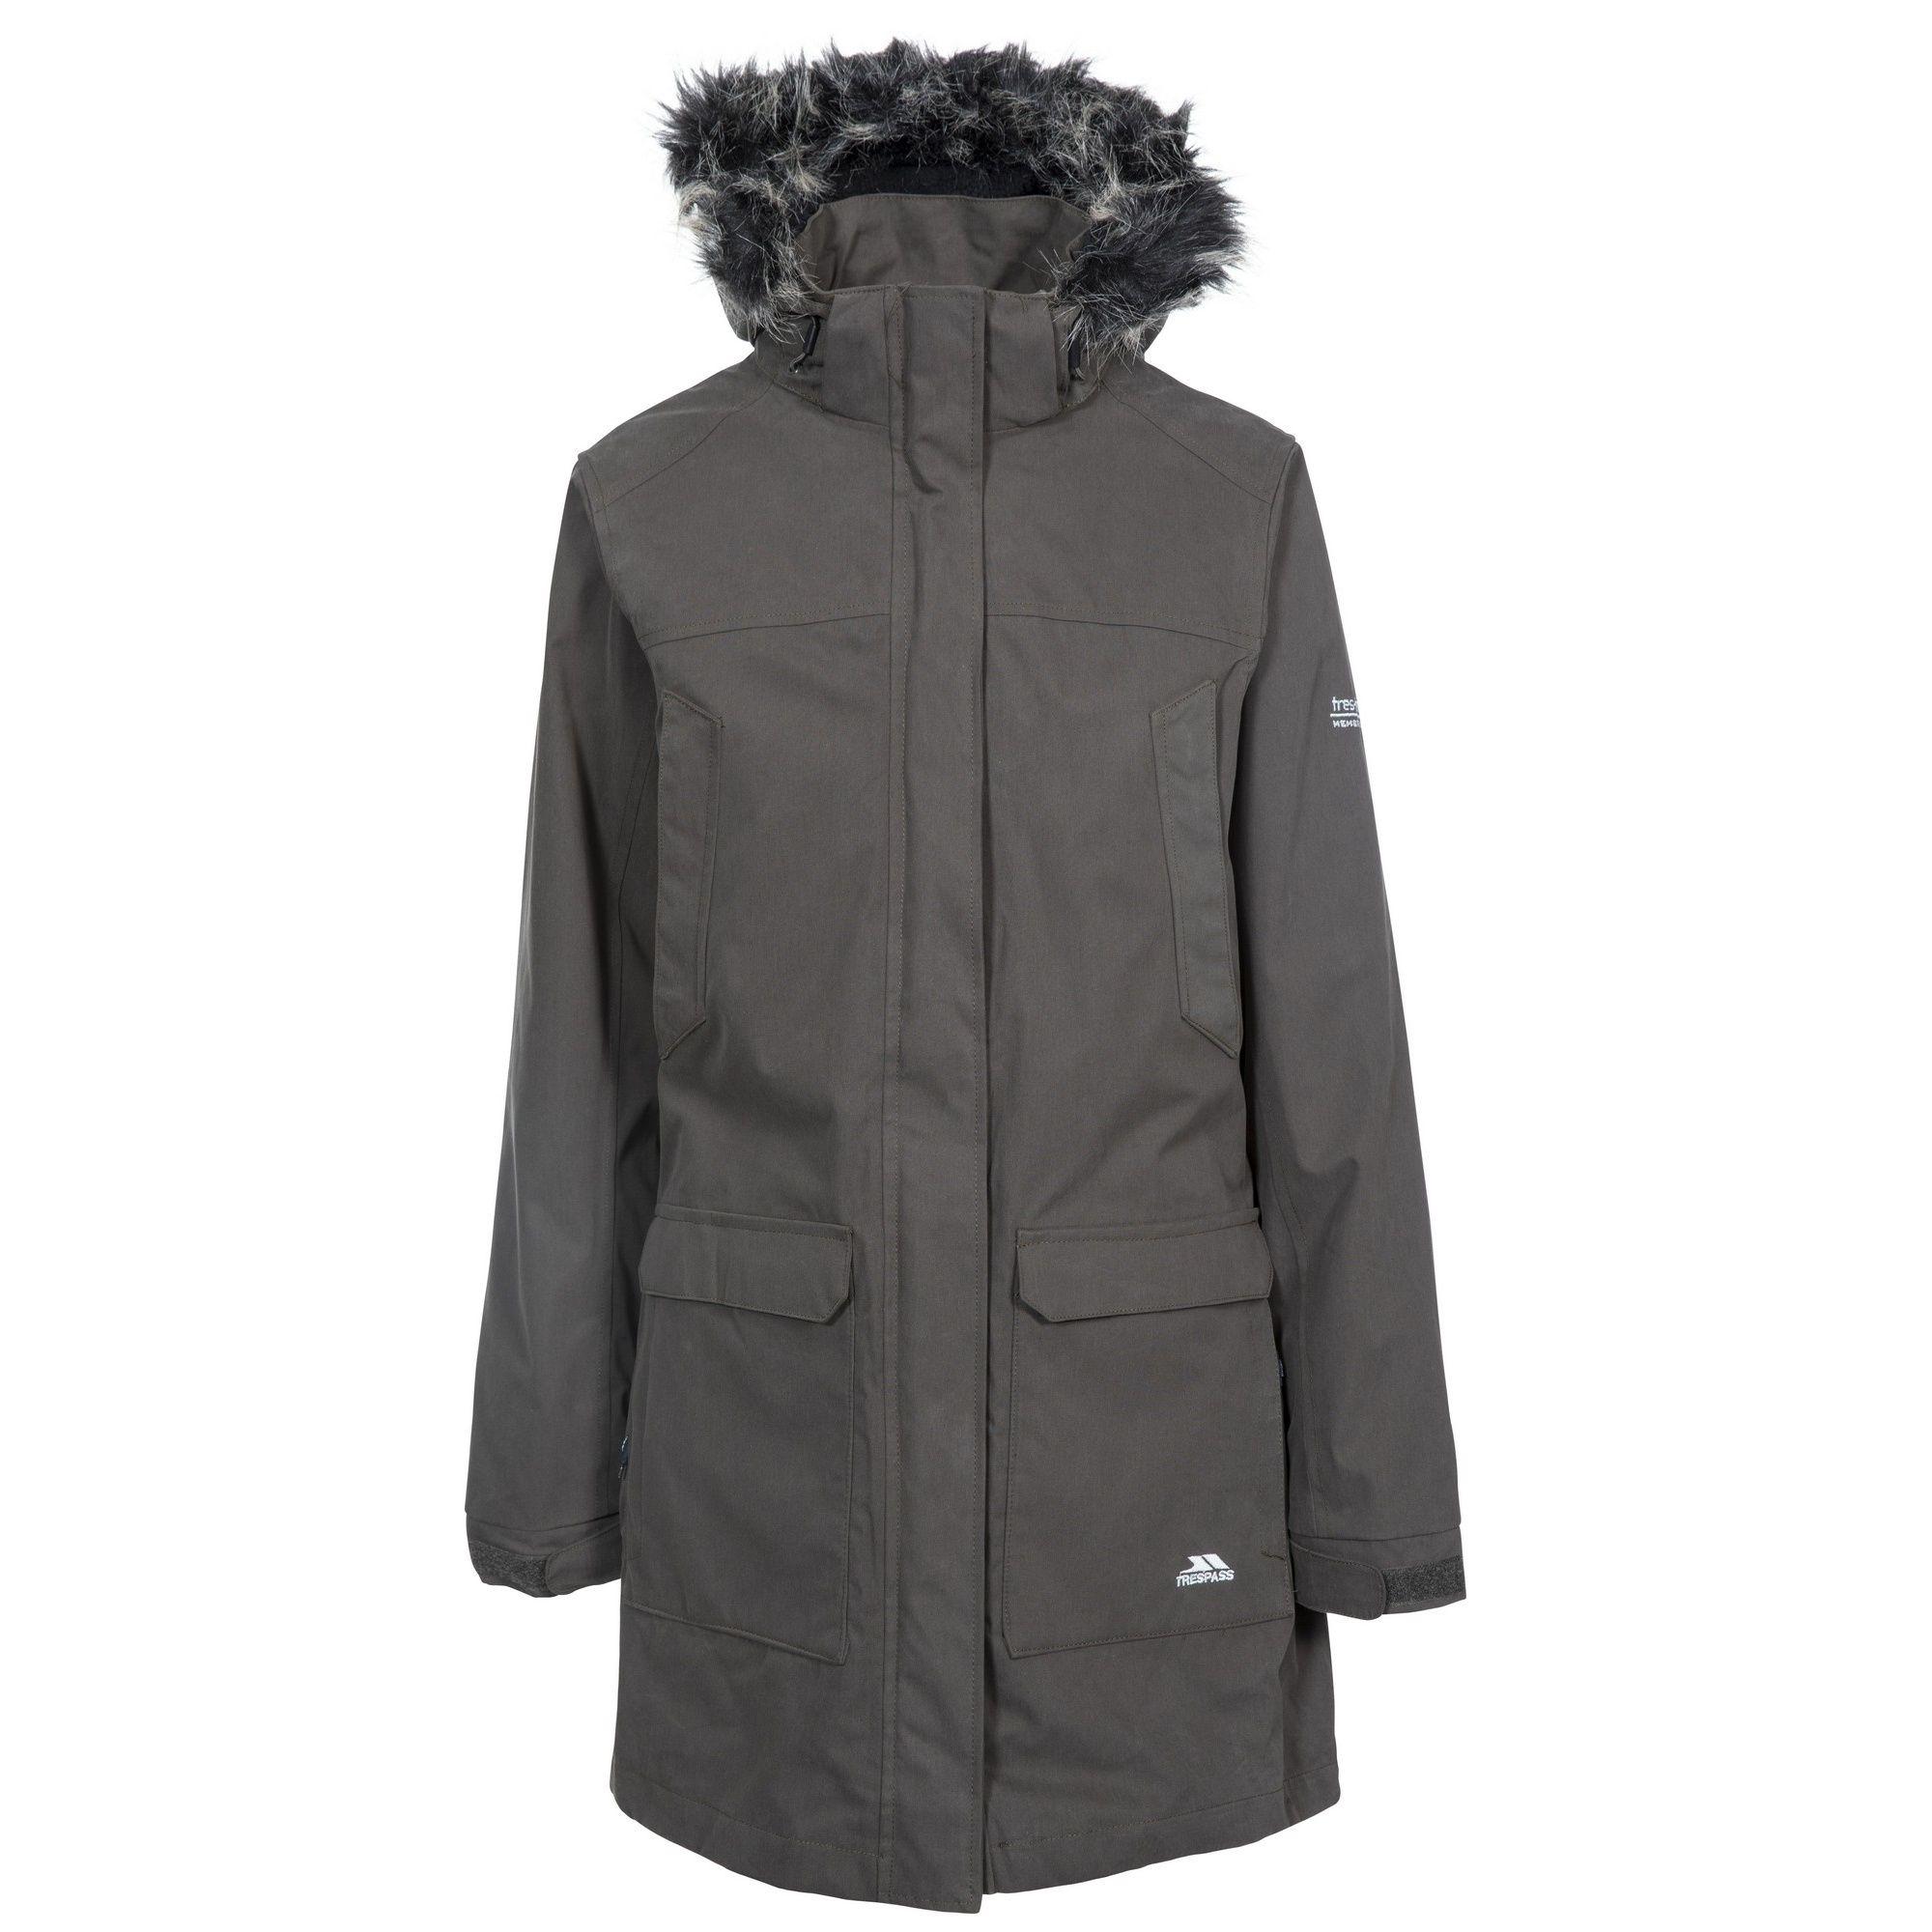 Trespass Womens/Ladies Maebell 3 In 1 Parka Waterproof Jacket